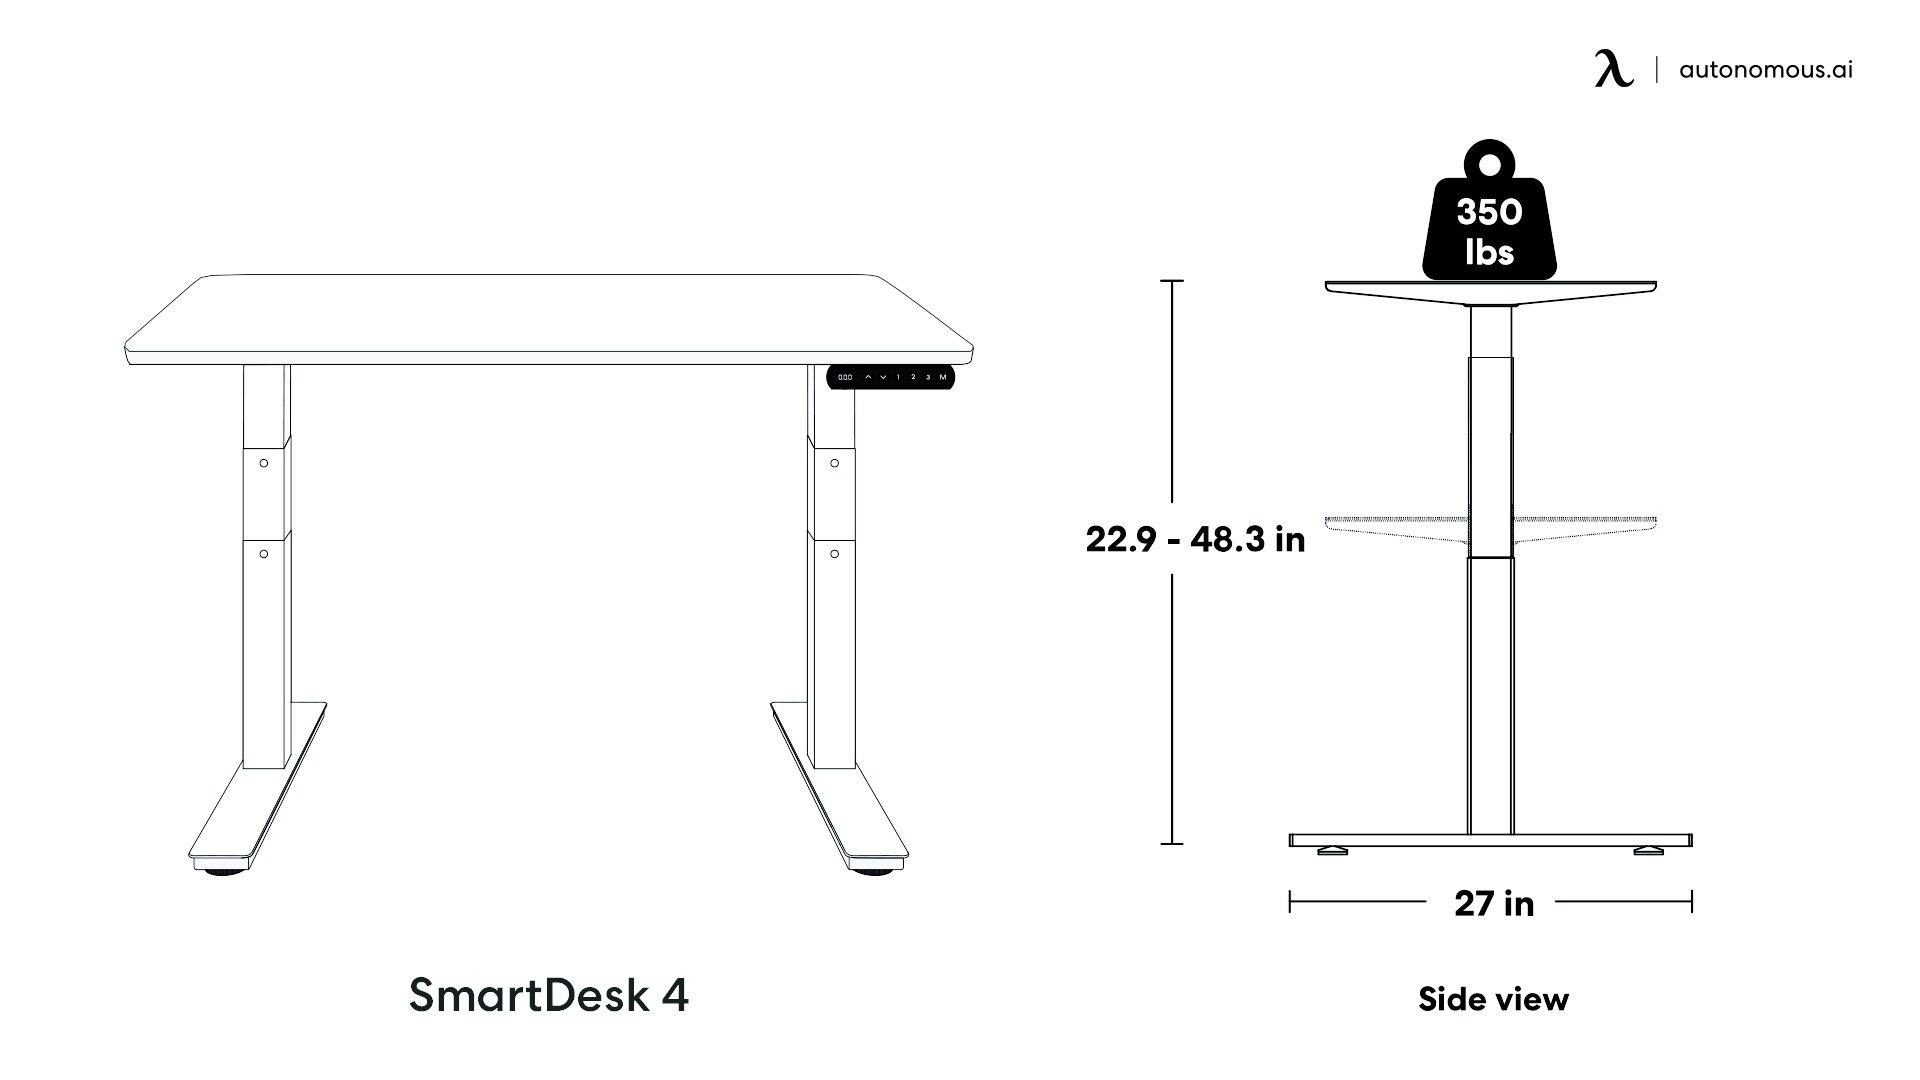 SmartDesk 4 Lifting Limit